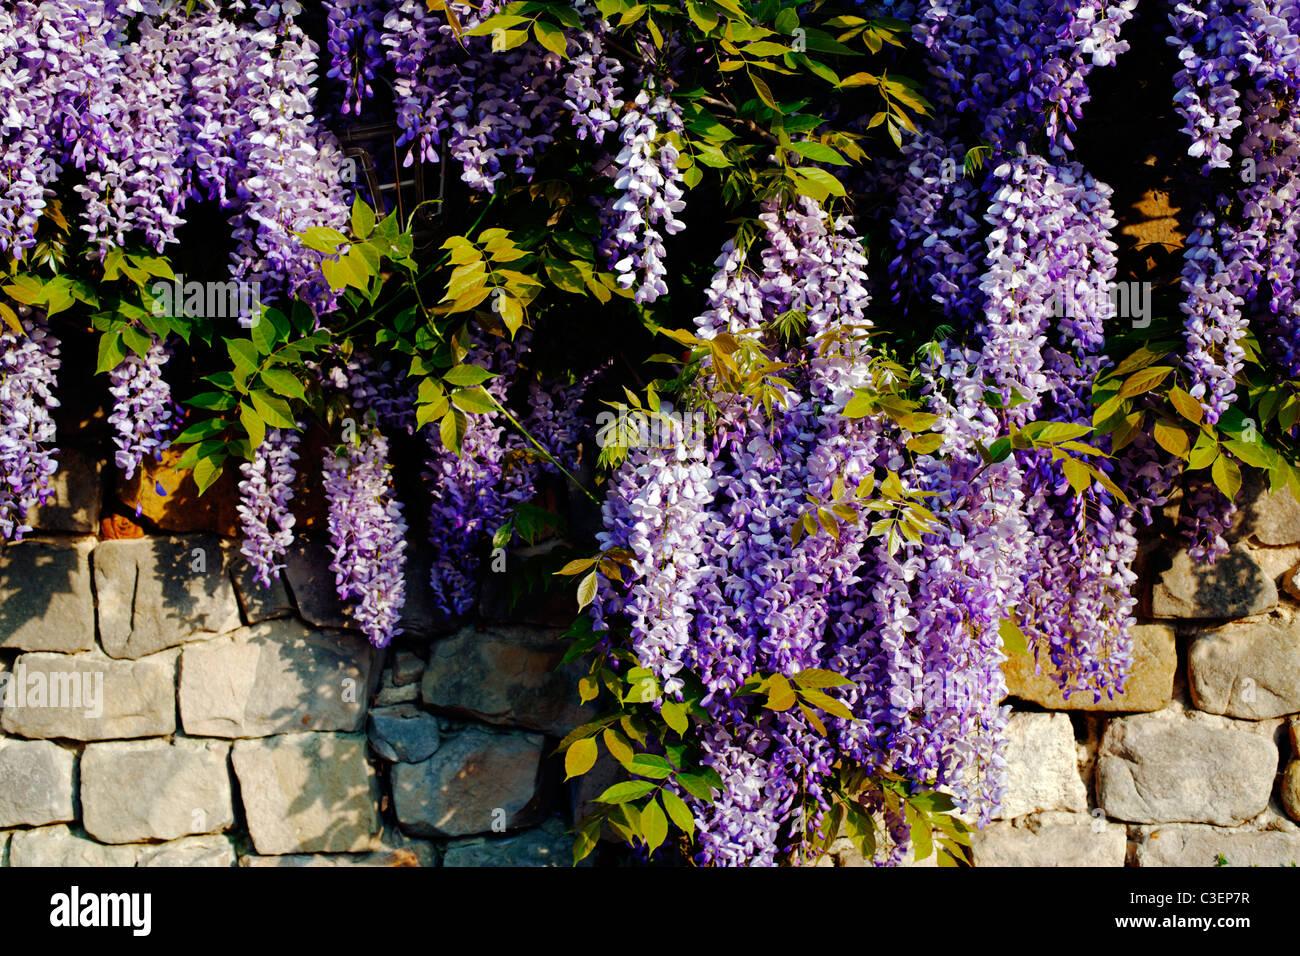 wisteria wall stockfotos wisteria wall bilder alamy. Black Bedroom Furniture Sets. Home Design Ideas